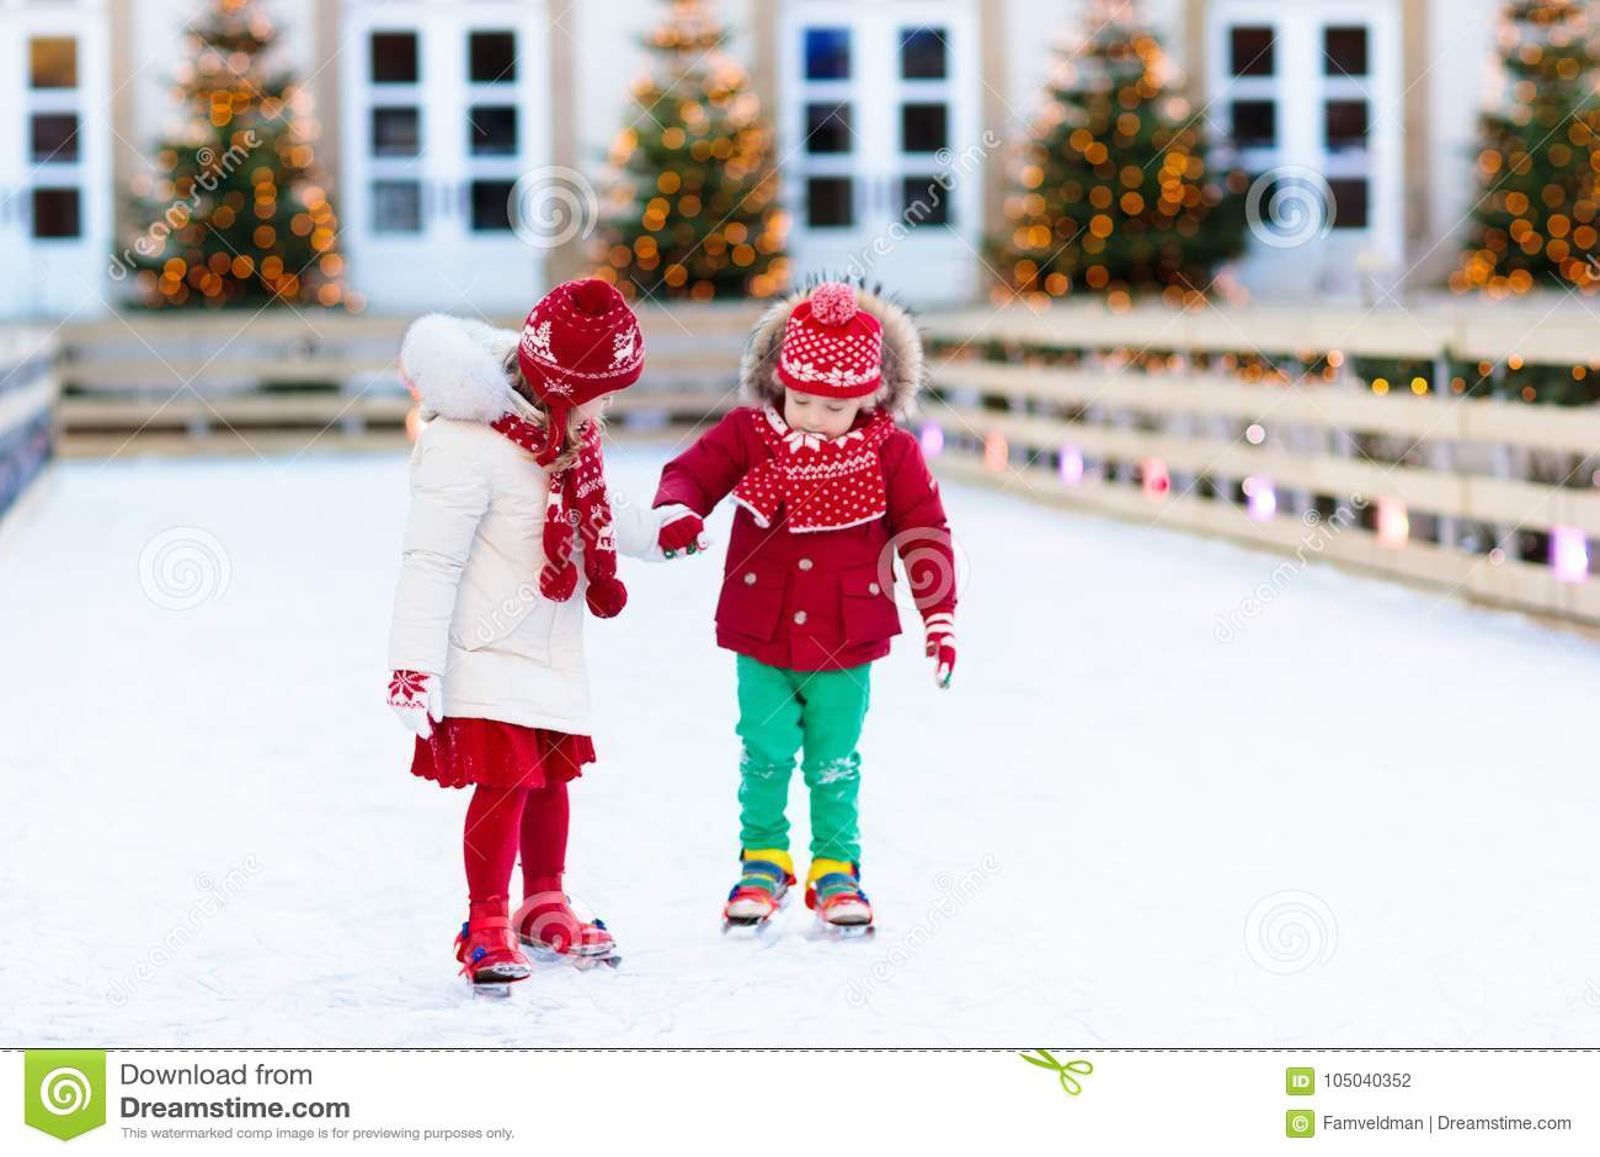 Kids Ice Skating In Winter. Ice Skates For Child. Stock Photo ...